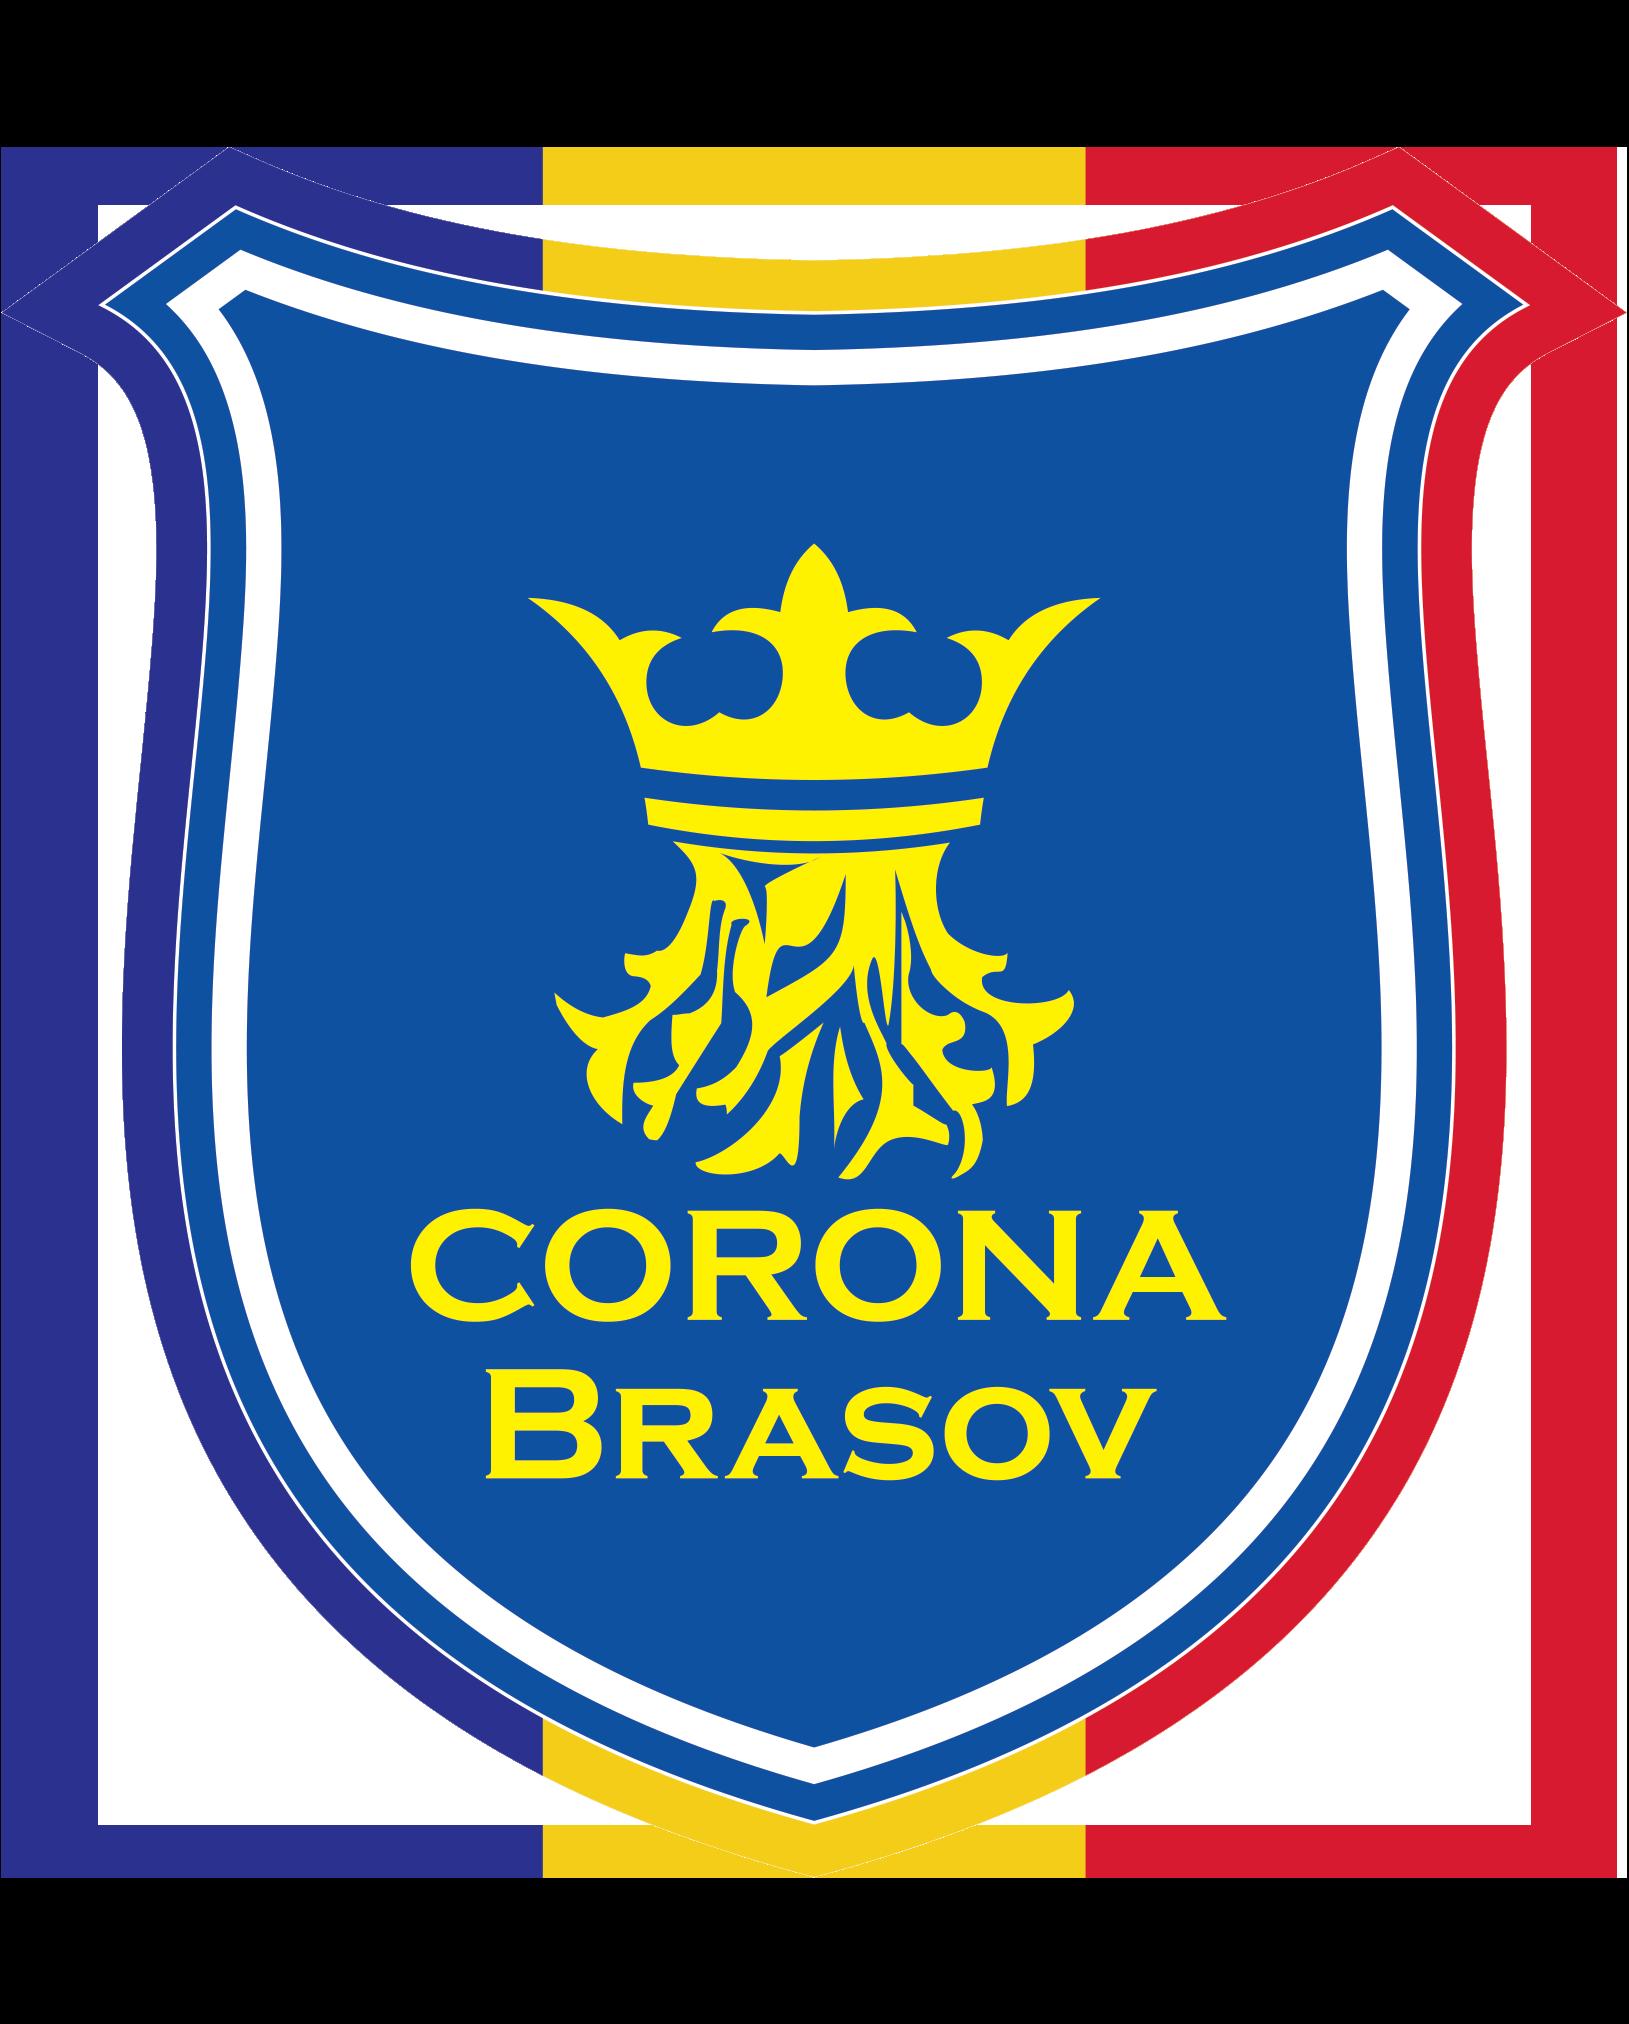 C.S.M. Corona Brasov